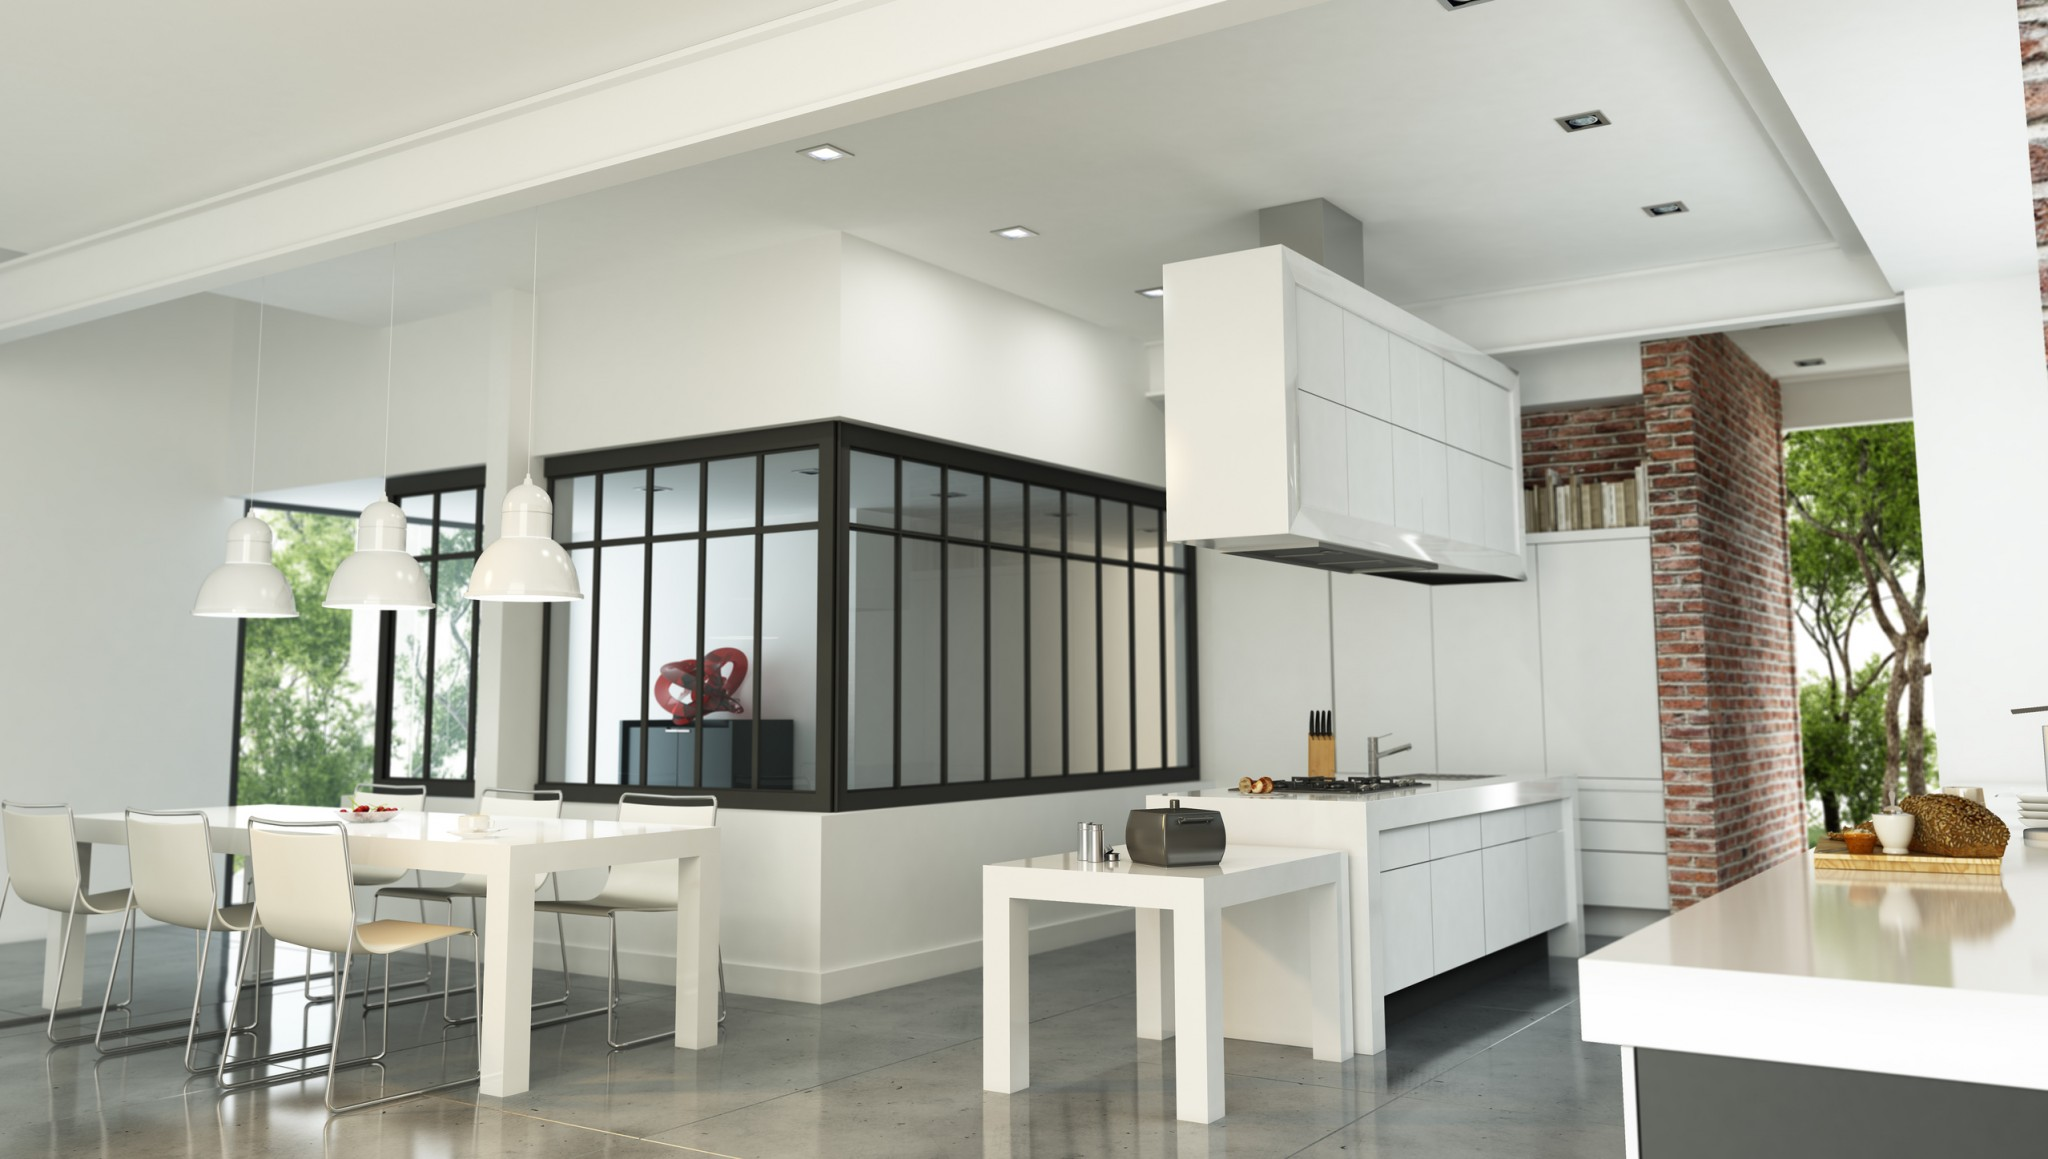 gamme 4m atelier 4m industries. Black Bedroom Furniture Sets. Home Design Ideas